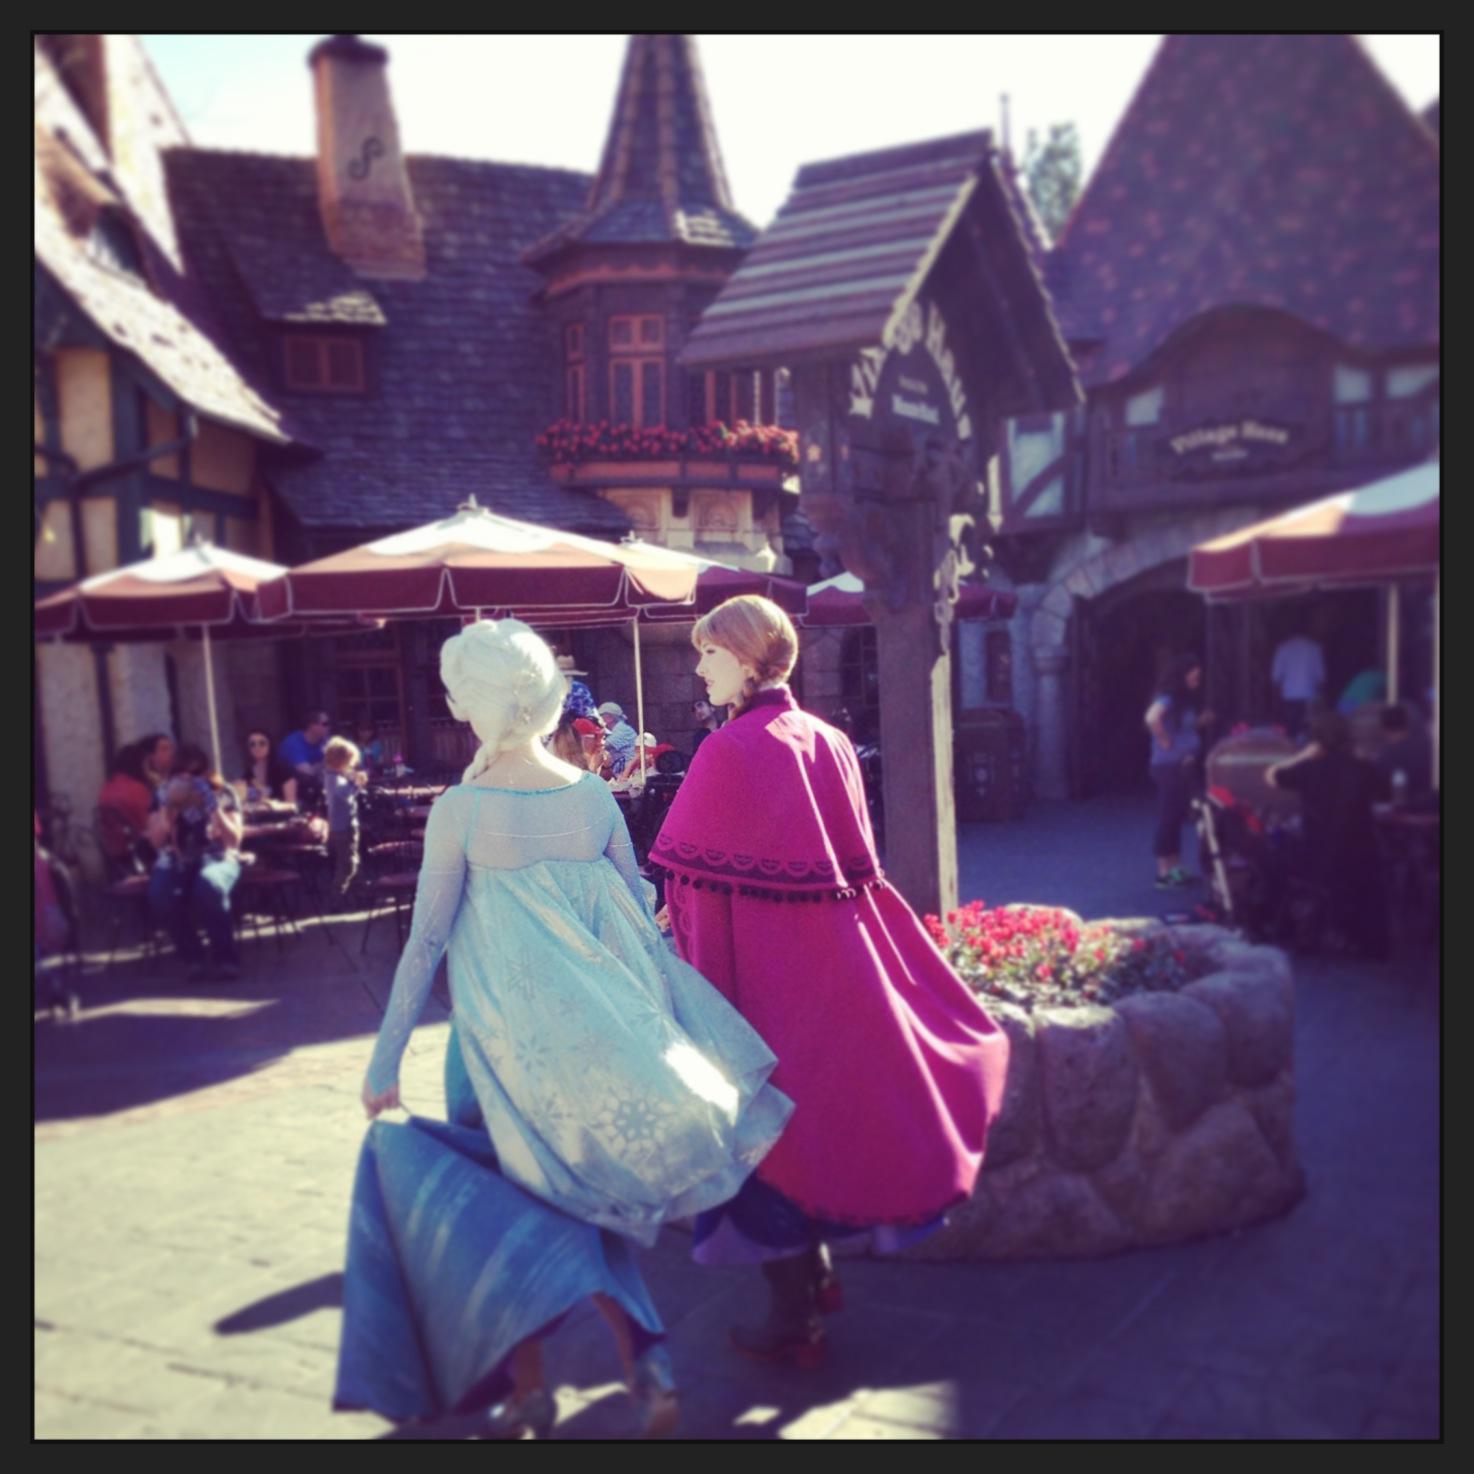 Tips to Disneyland's Roaming Characters